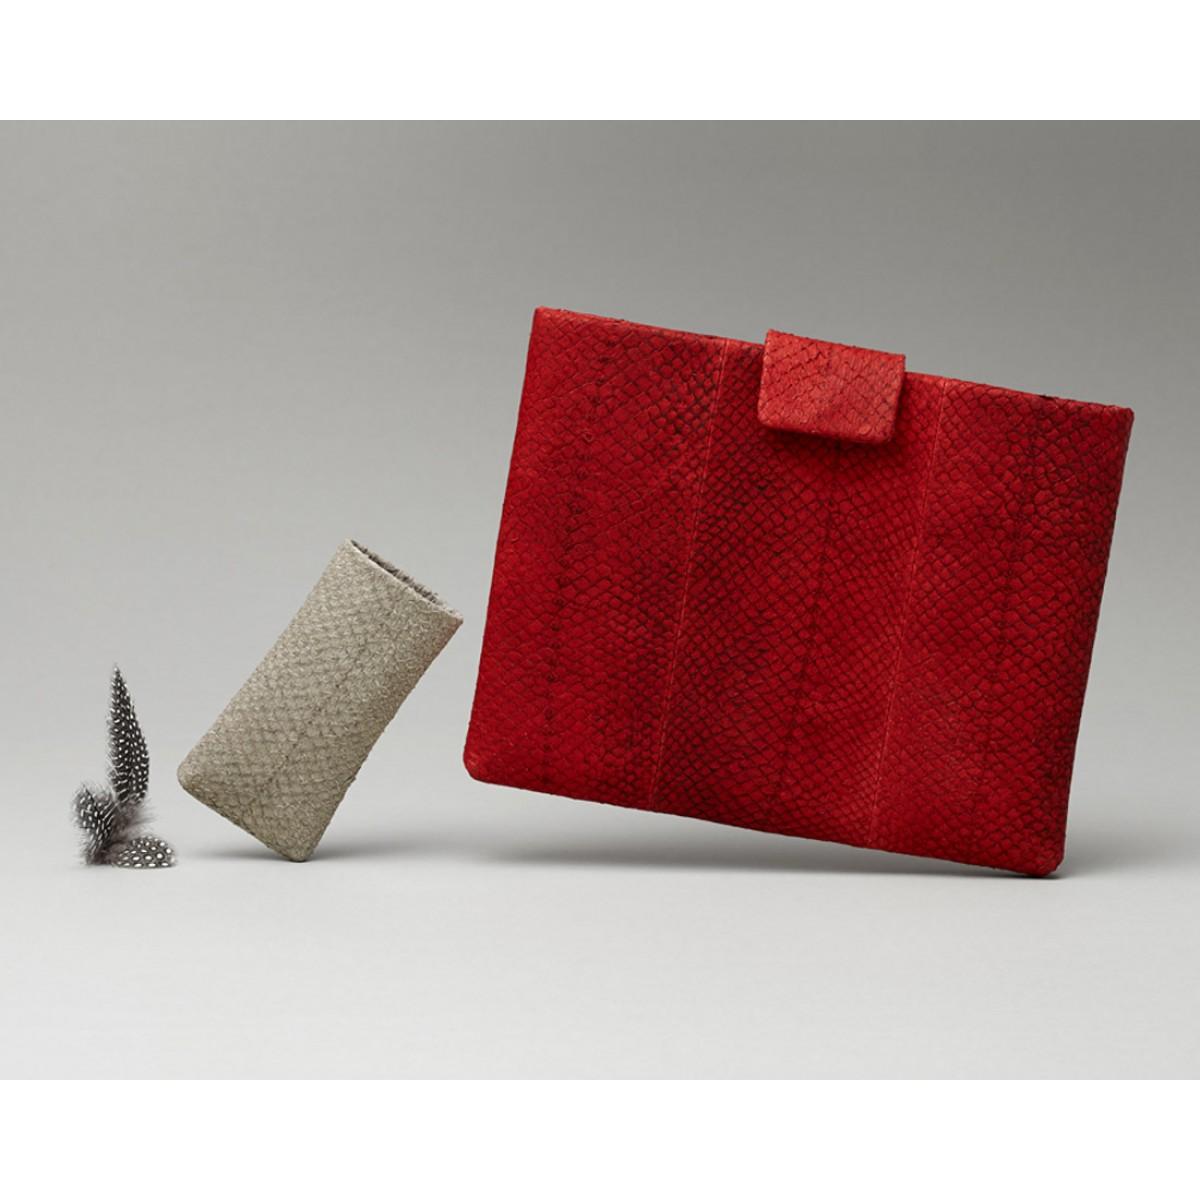 Lapàporter iPad case Lachsleder, rot